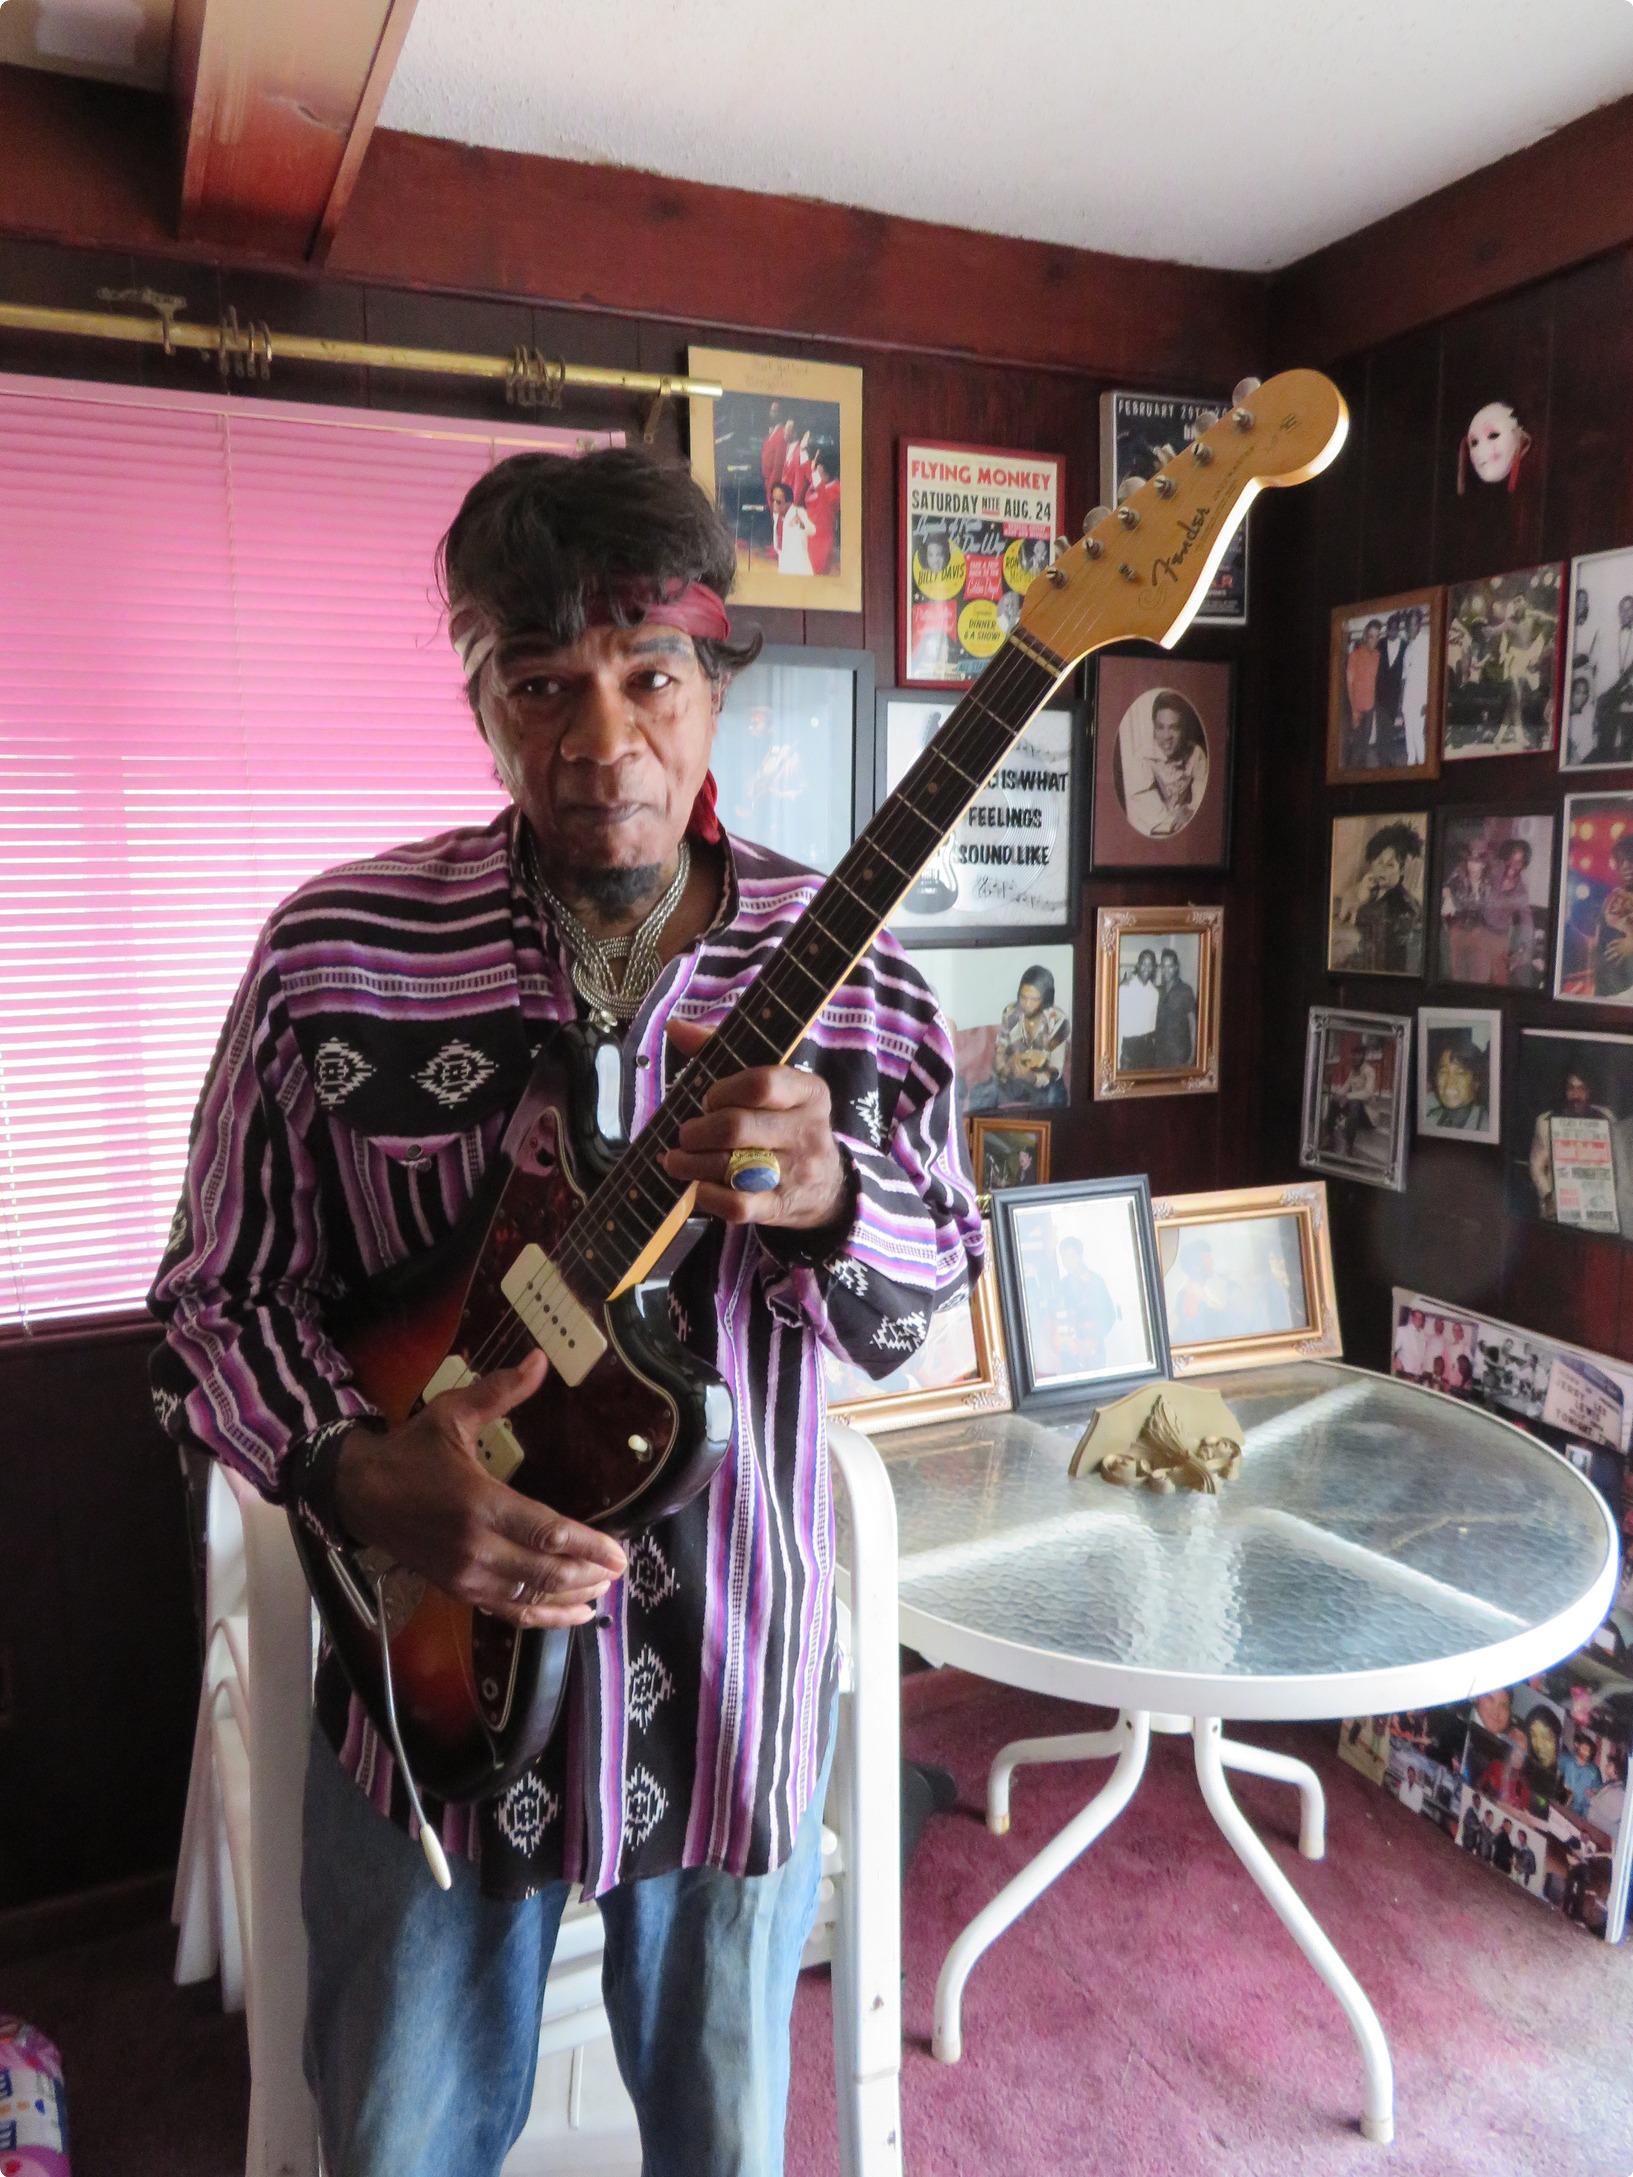 hight resolution of fender jimi hendrix jazzmaster 1964 sunburst guitar for sale rock wiring diagram jimi hendrix jazzmaster guitar fender telecaster wiring